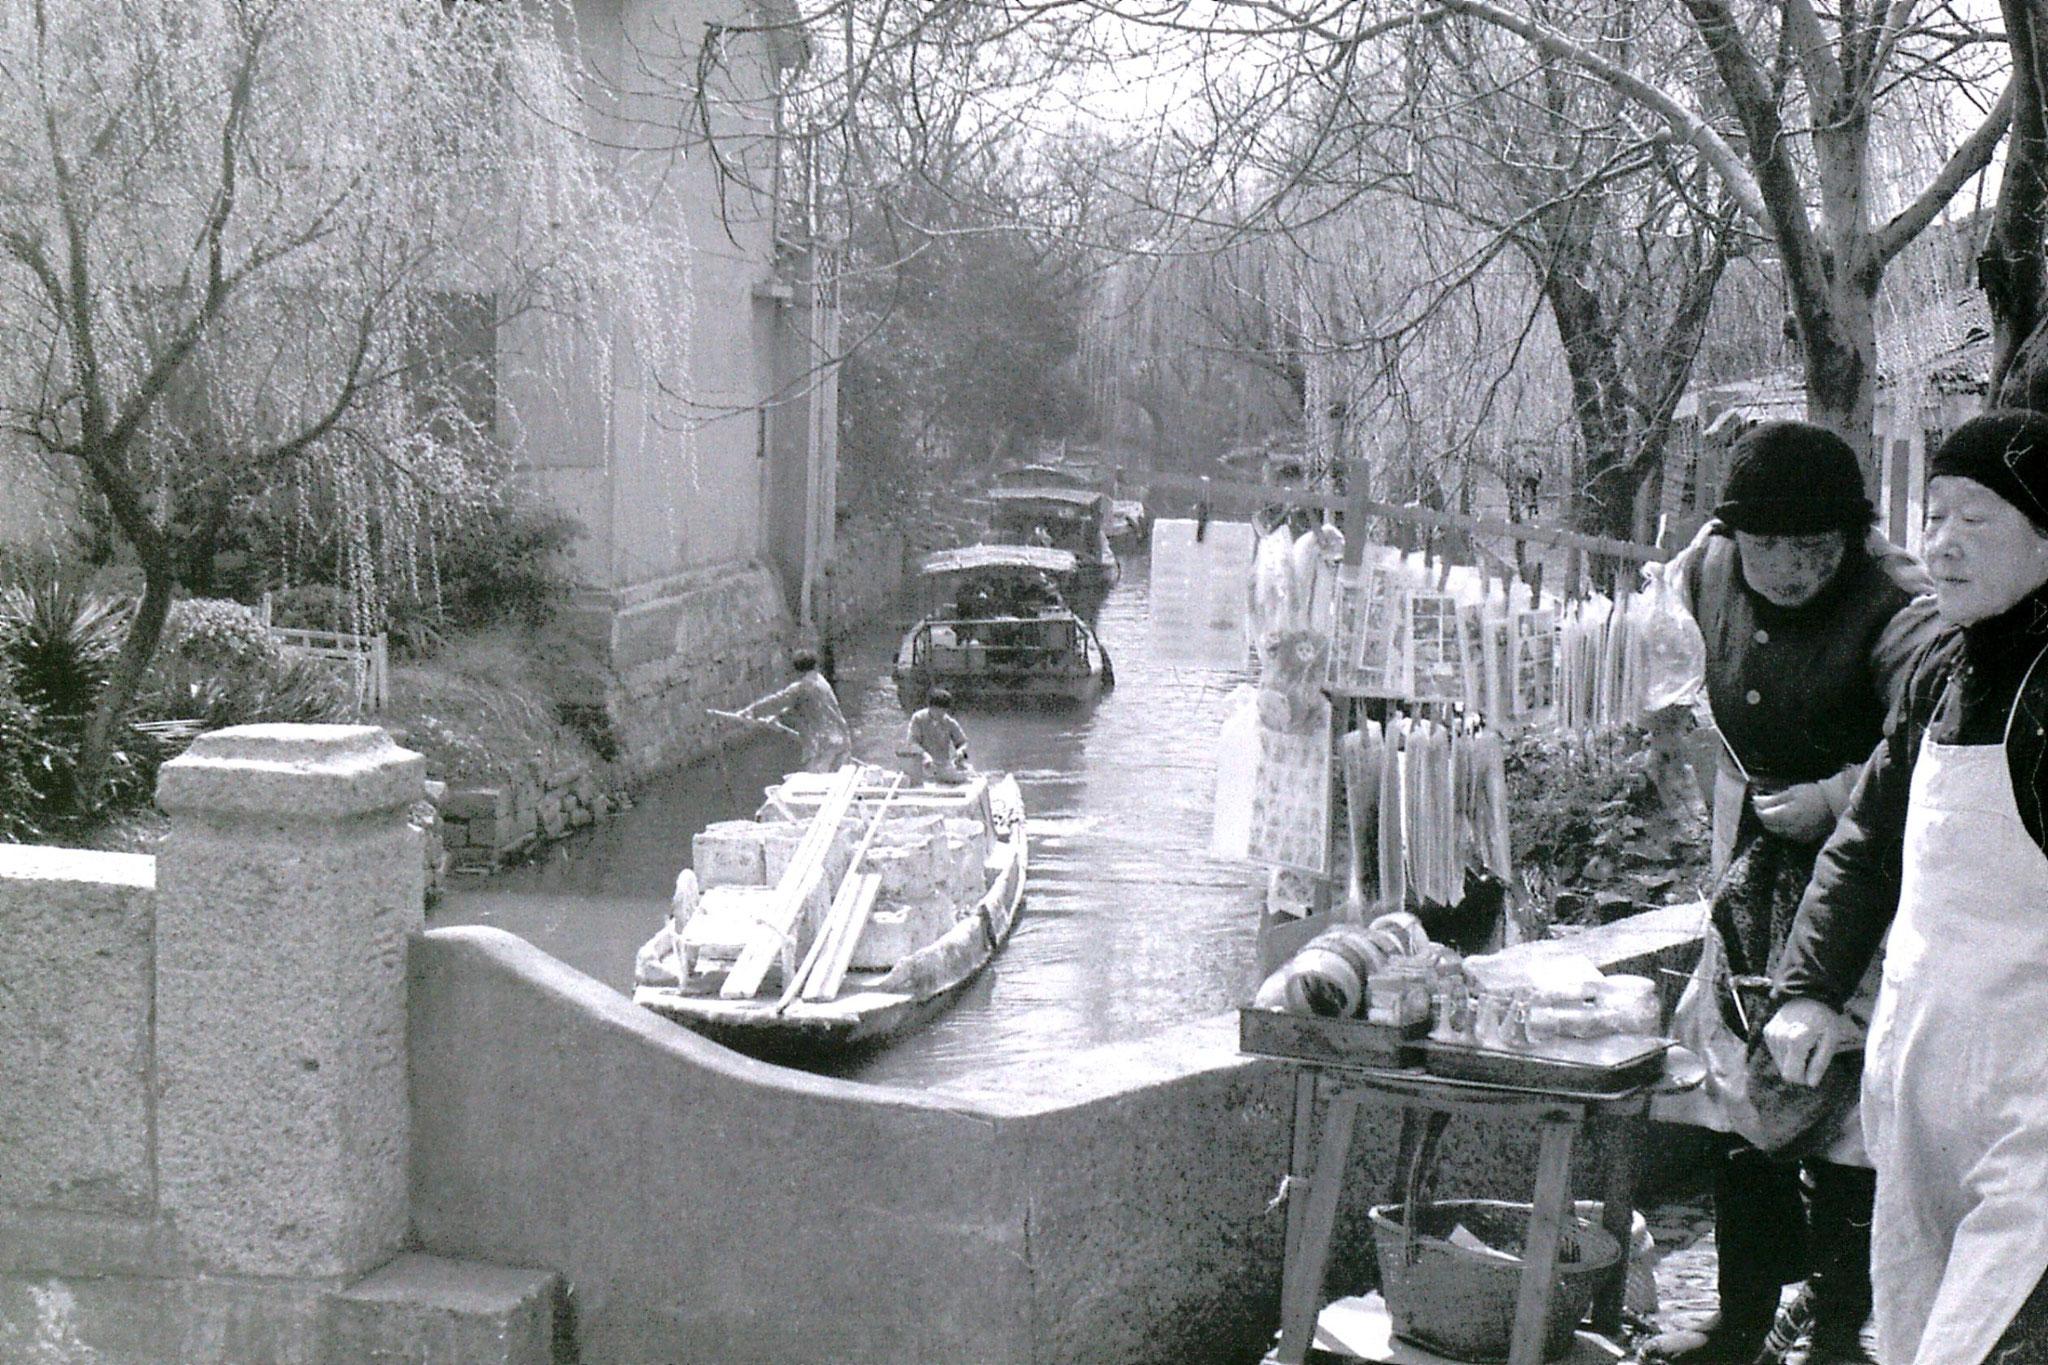 20/3/1989: 14: Suzhou canal near Twin pagodas